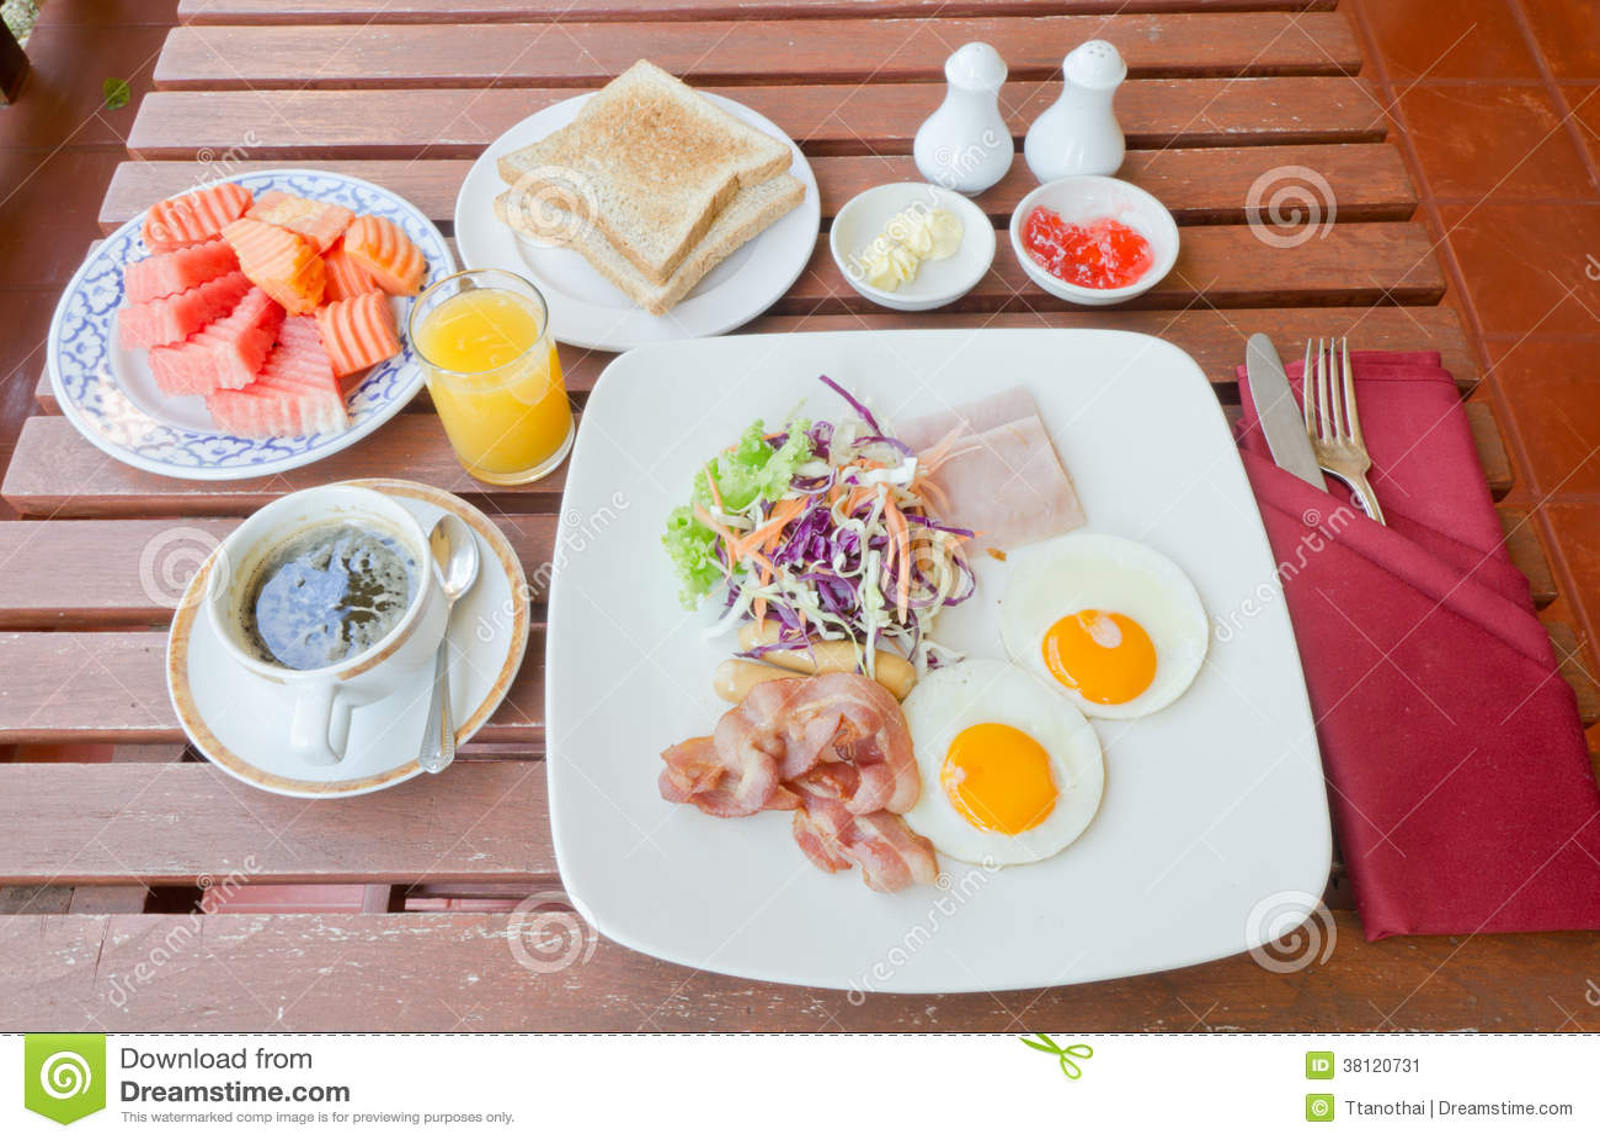 American table setting - Breakfast Table